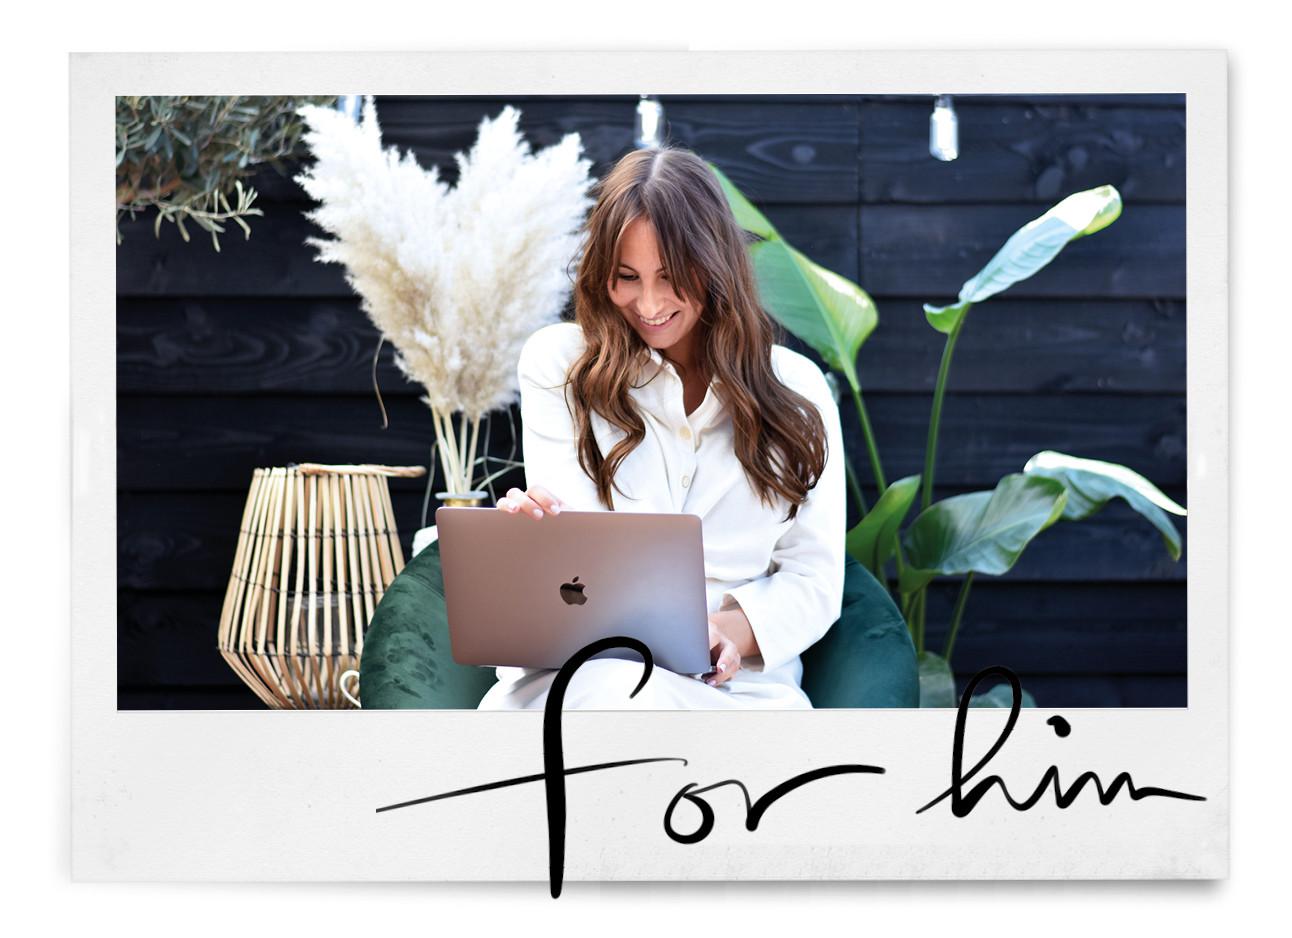 Lilian brijl met laptop in de tuin